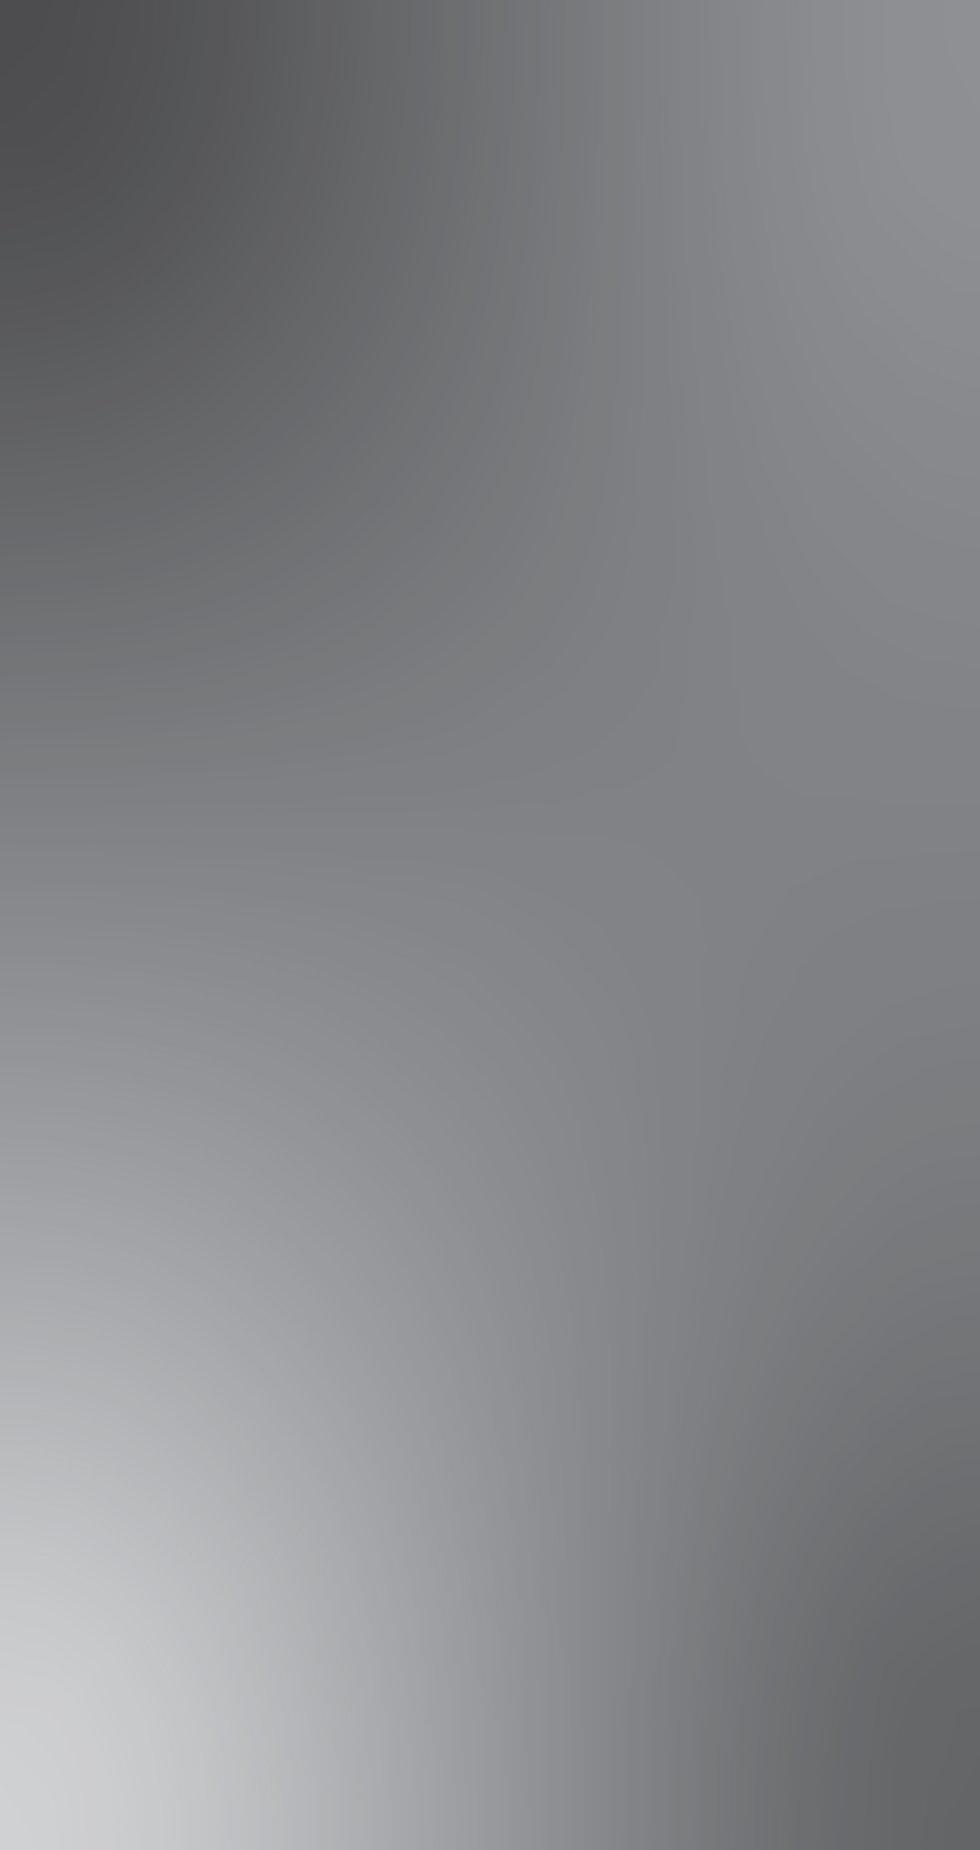 background-grey.jpg